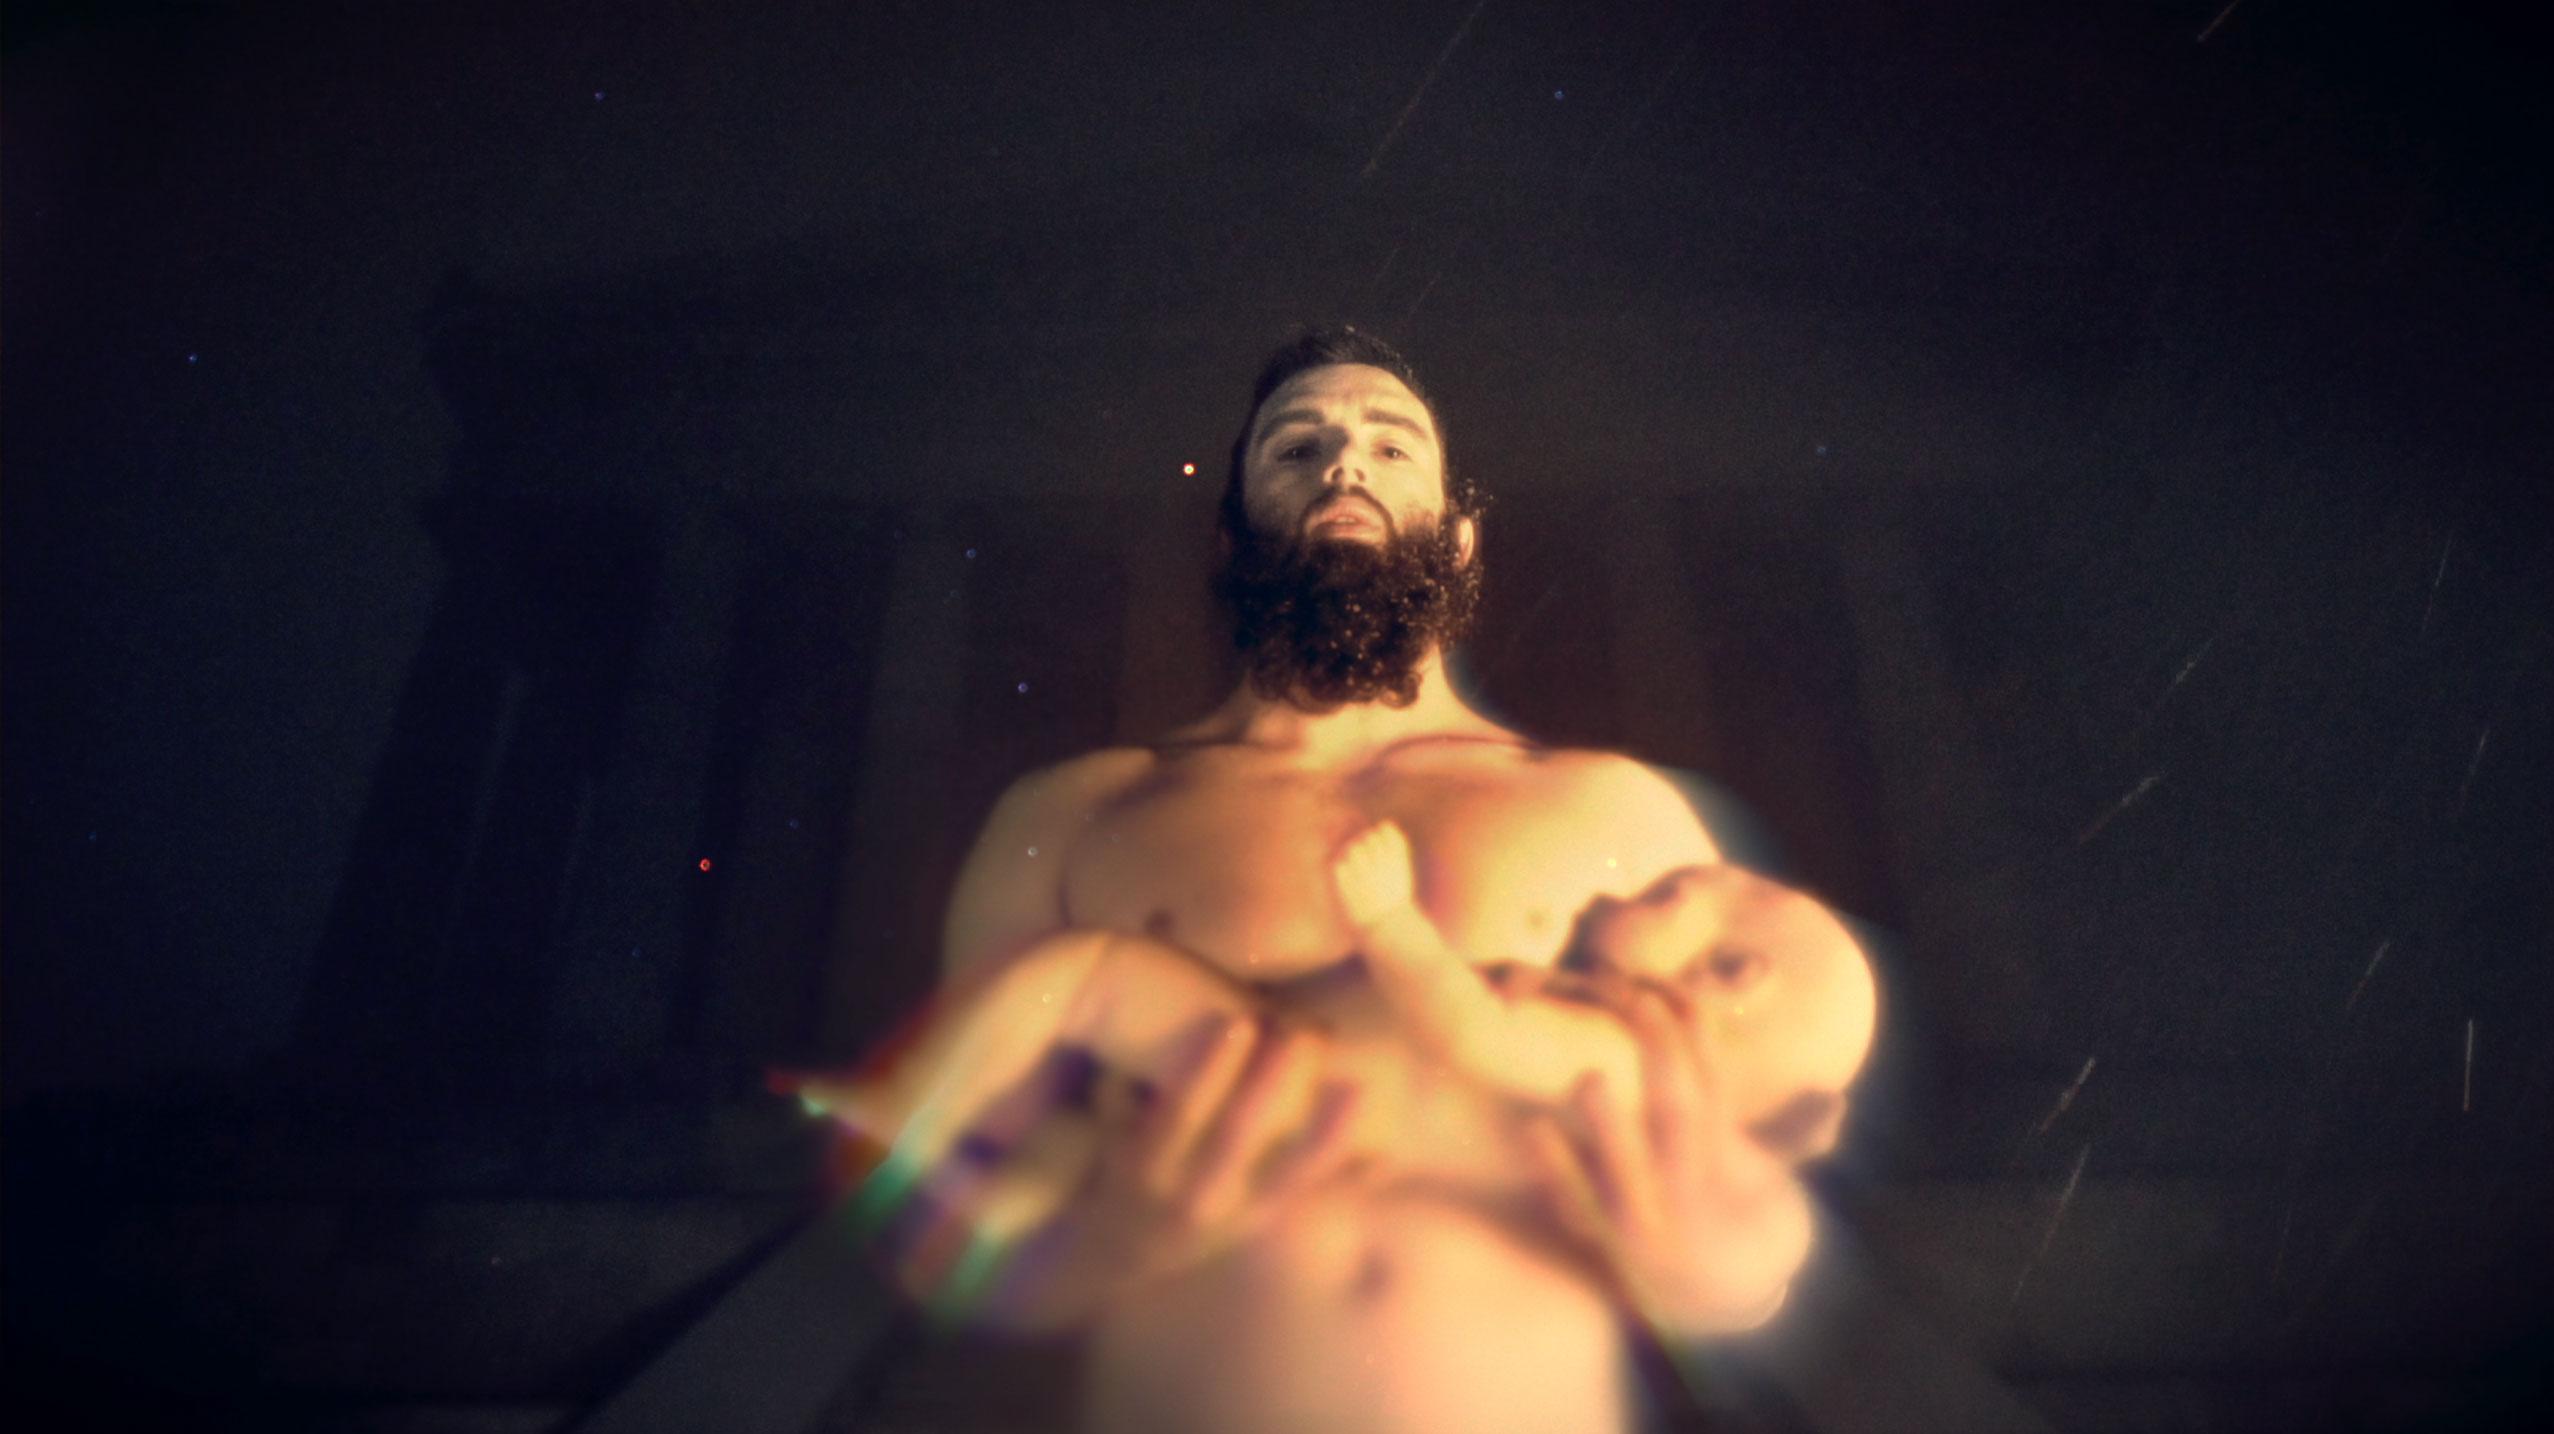 Ónfalo, 2016, proyección de vídeo monocanal, color, sonido, 90 minutos (película)